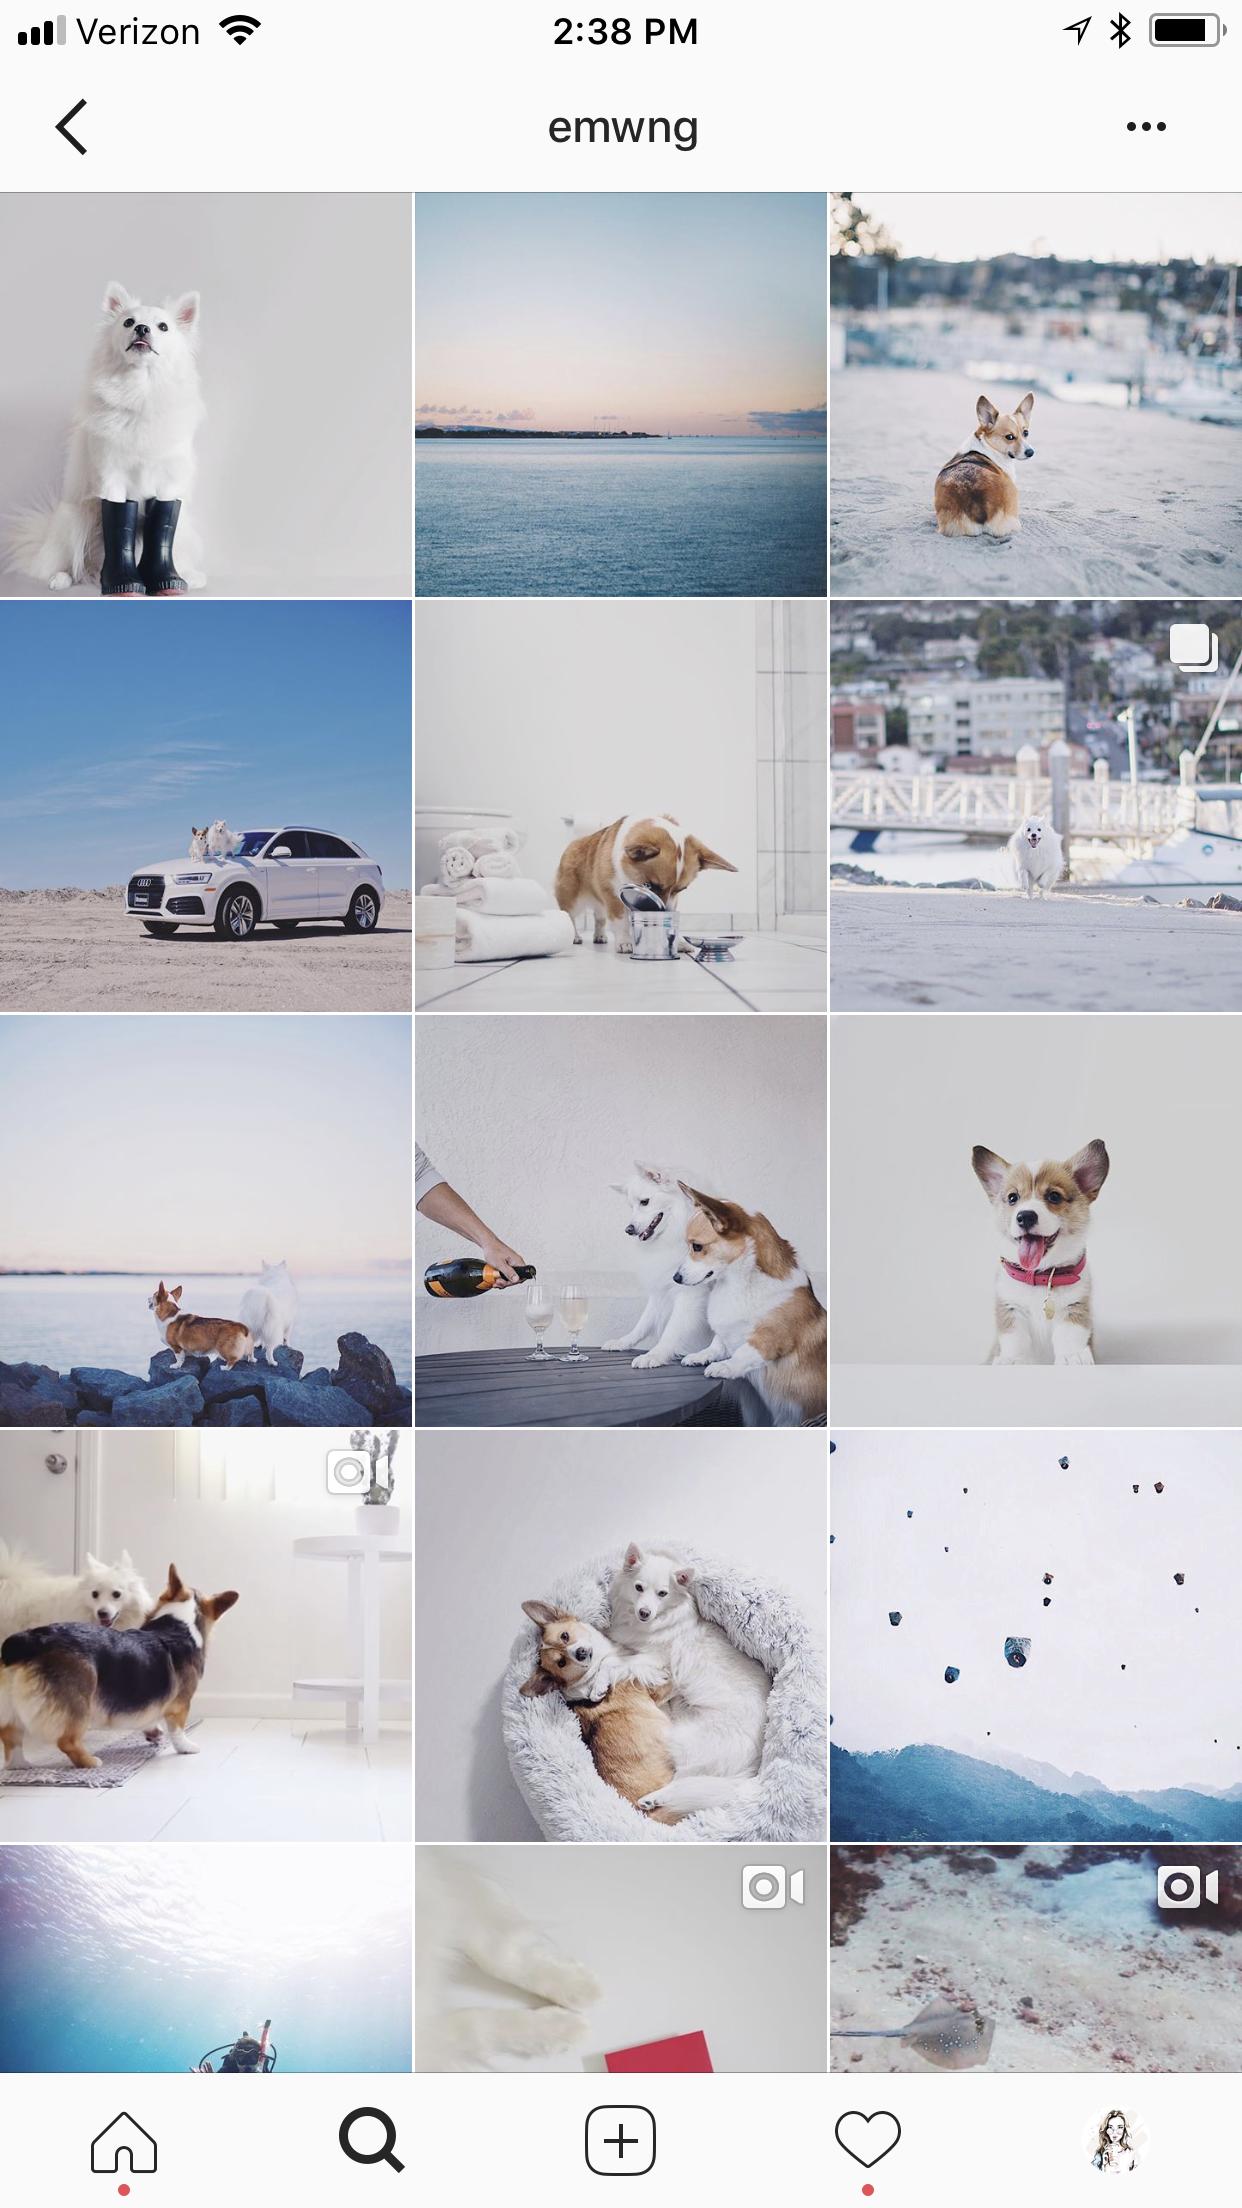 @emwng (minimalist AND puppies!!!)